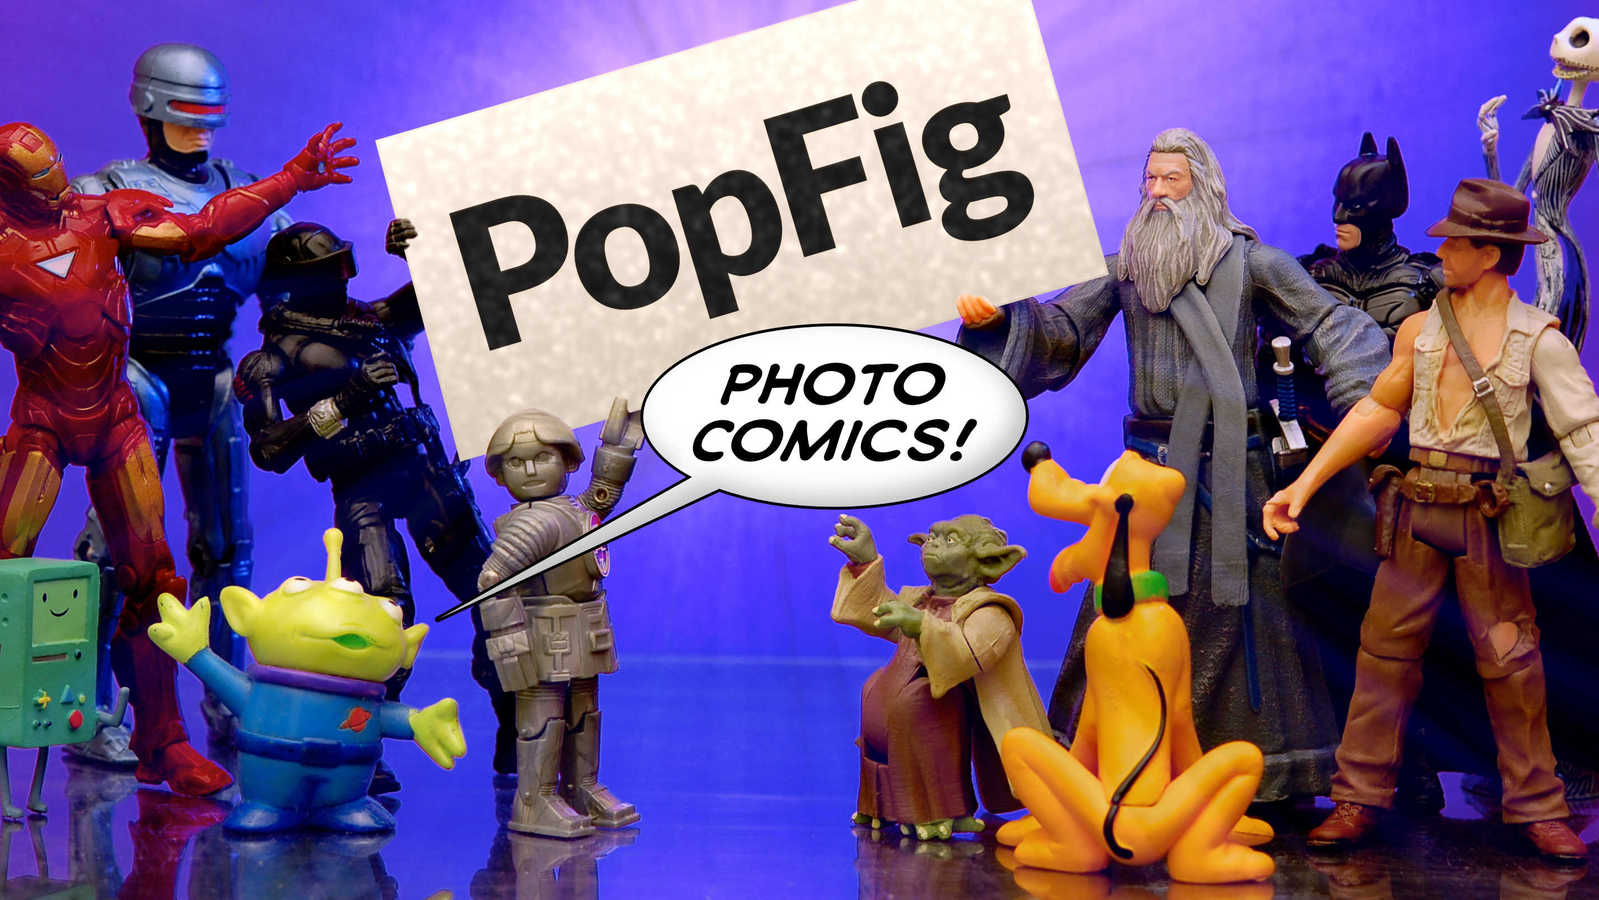 PopFig Photo Comics